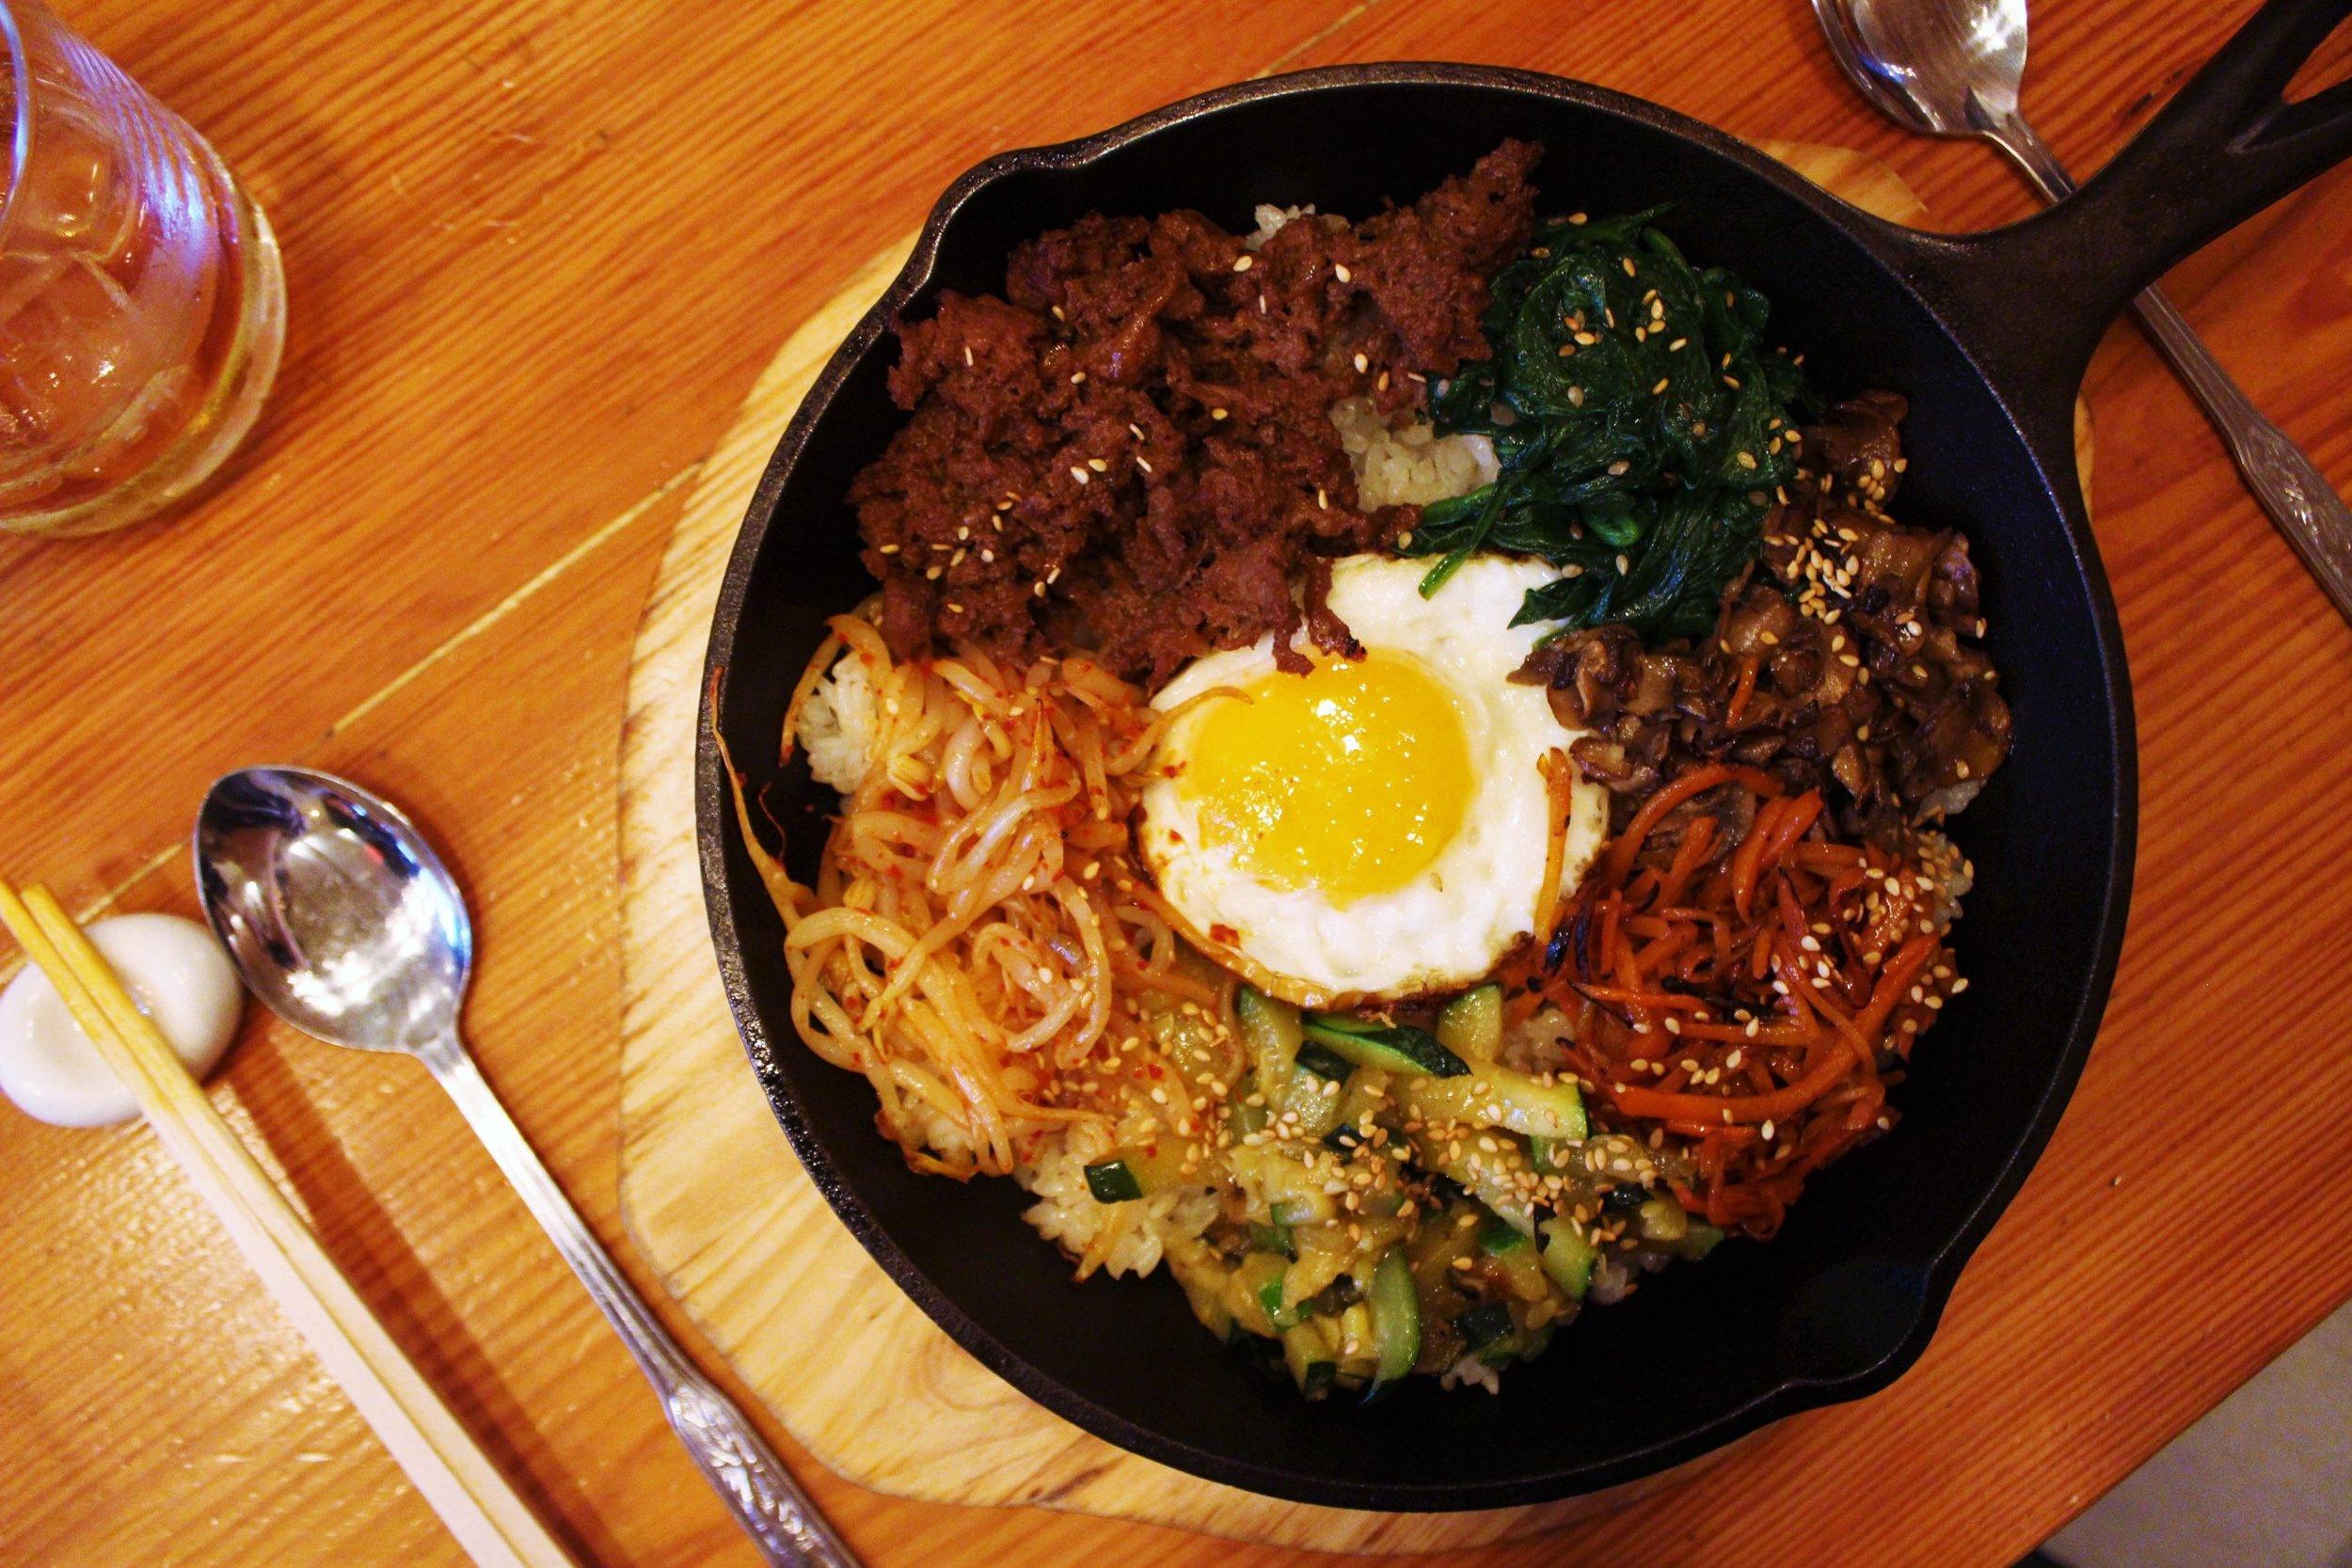 Beef Bulgogi Bibimbap in Sizzling Hot Plate at Danji